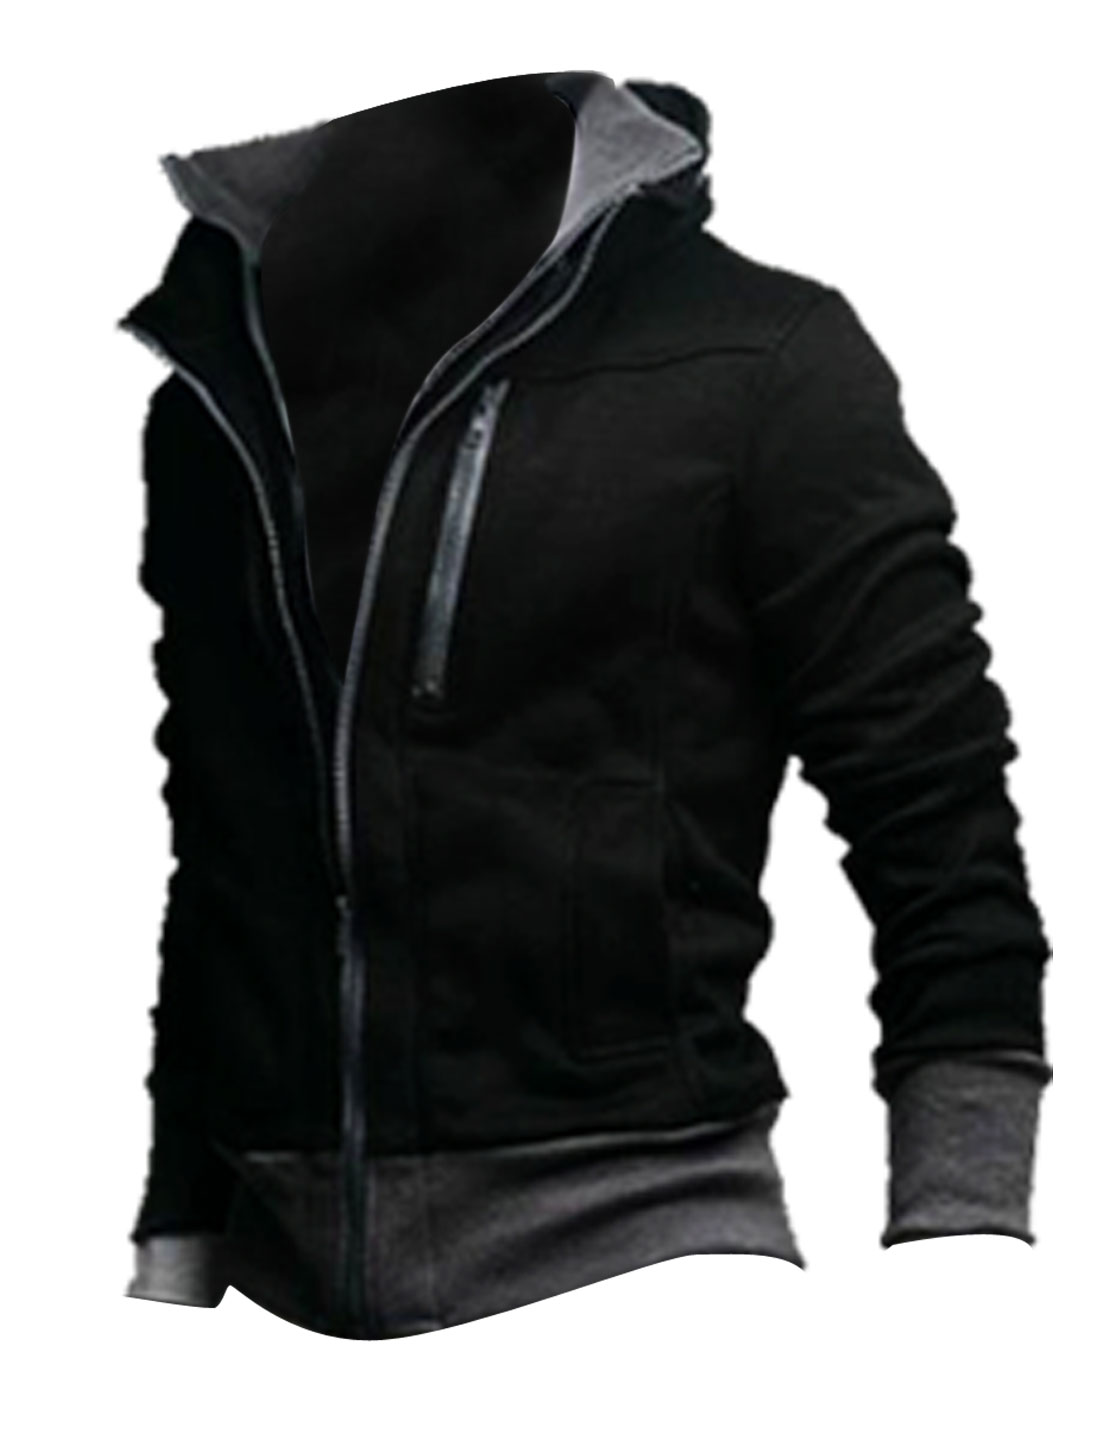 Men 2-fer Long Sleeve Stand Collar Zipper Coat Jacket Black L